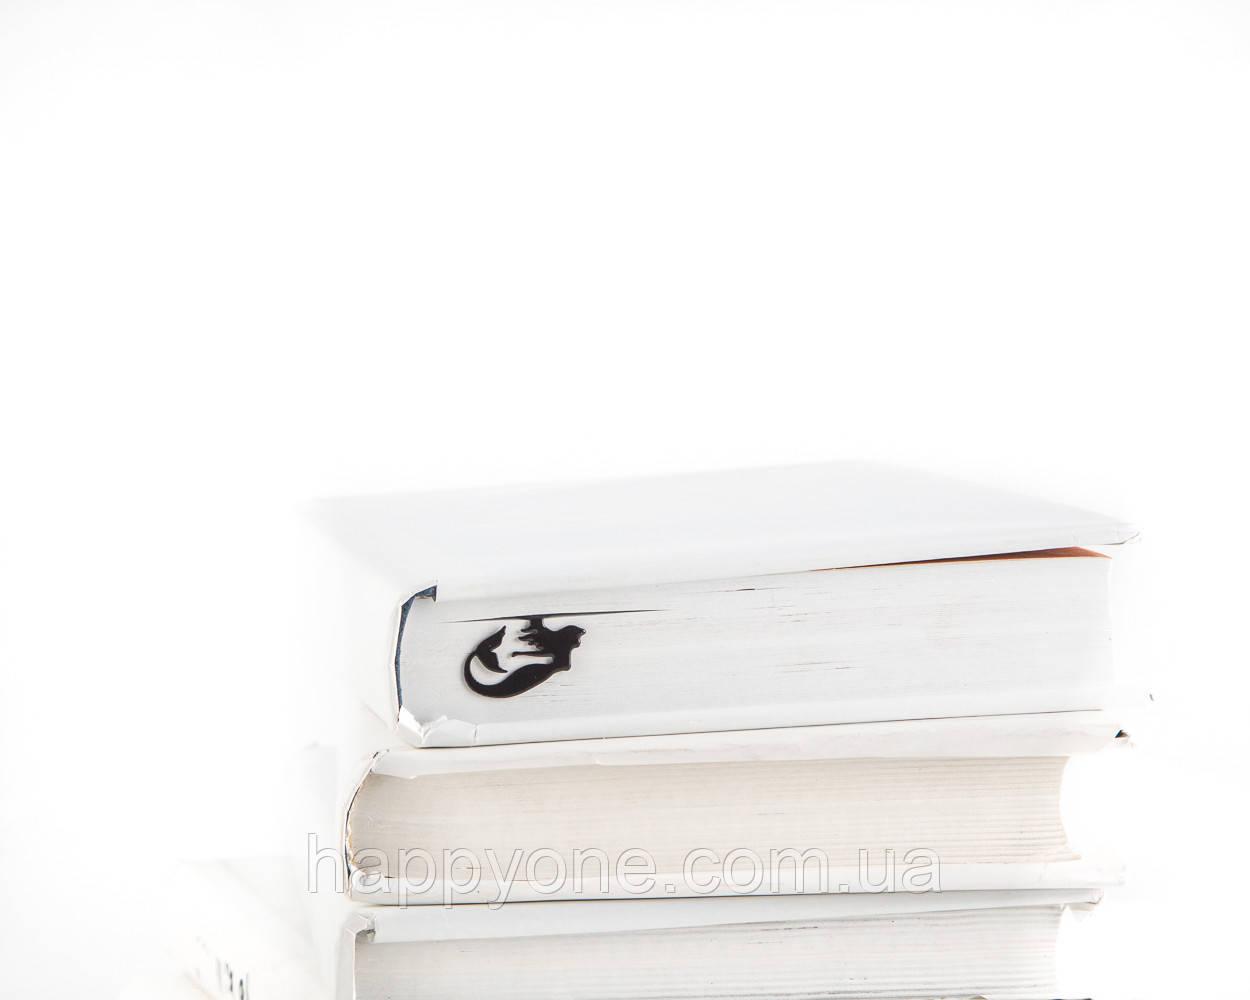 Закладка для книг Русалка